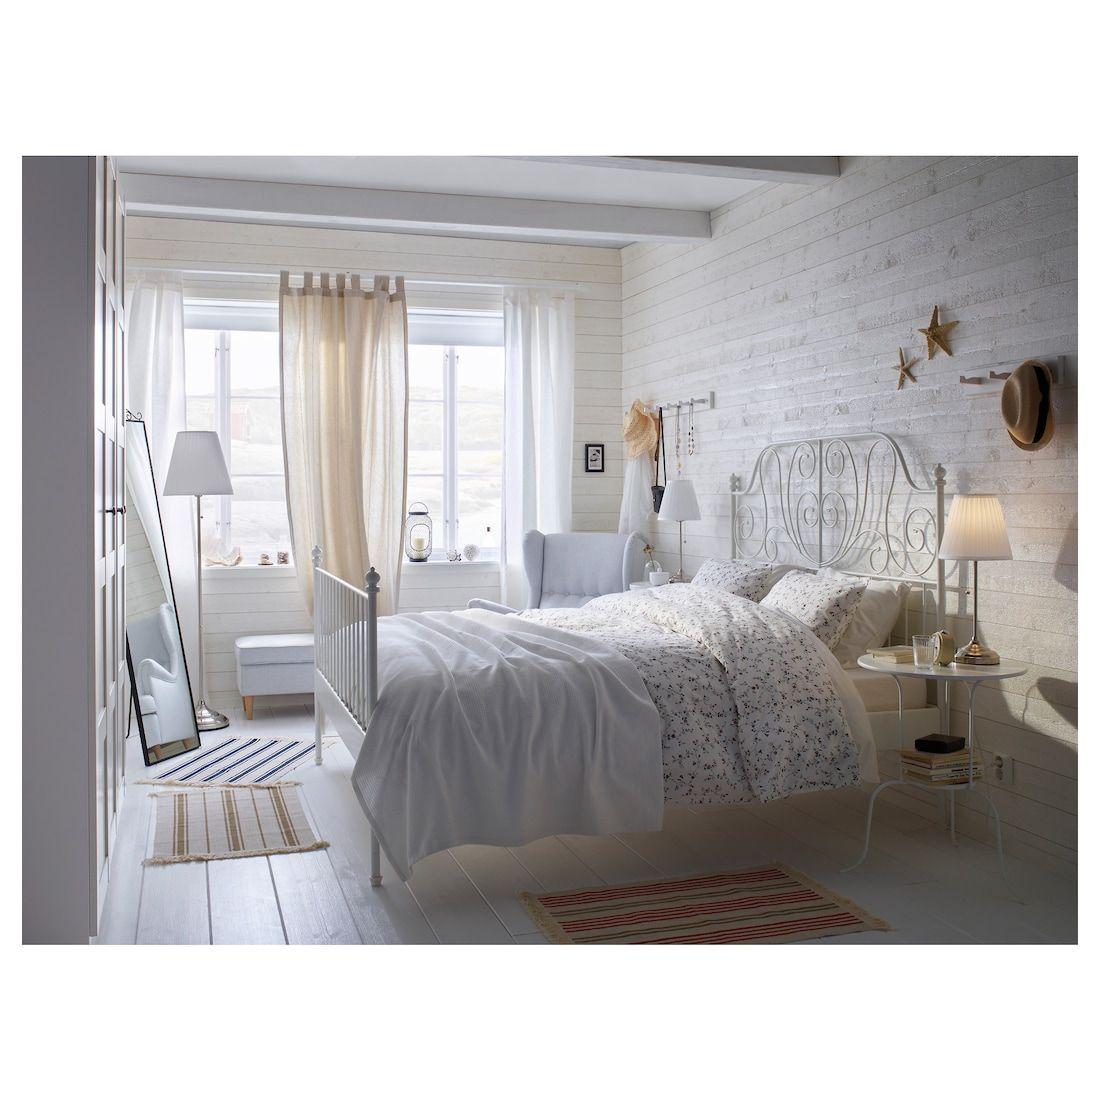 Leirvik Estructura Cama Blanco 140x200 Cm Ikea In 2020 White Metal Bed White Metal Bed Frame White Bed Frame